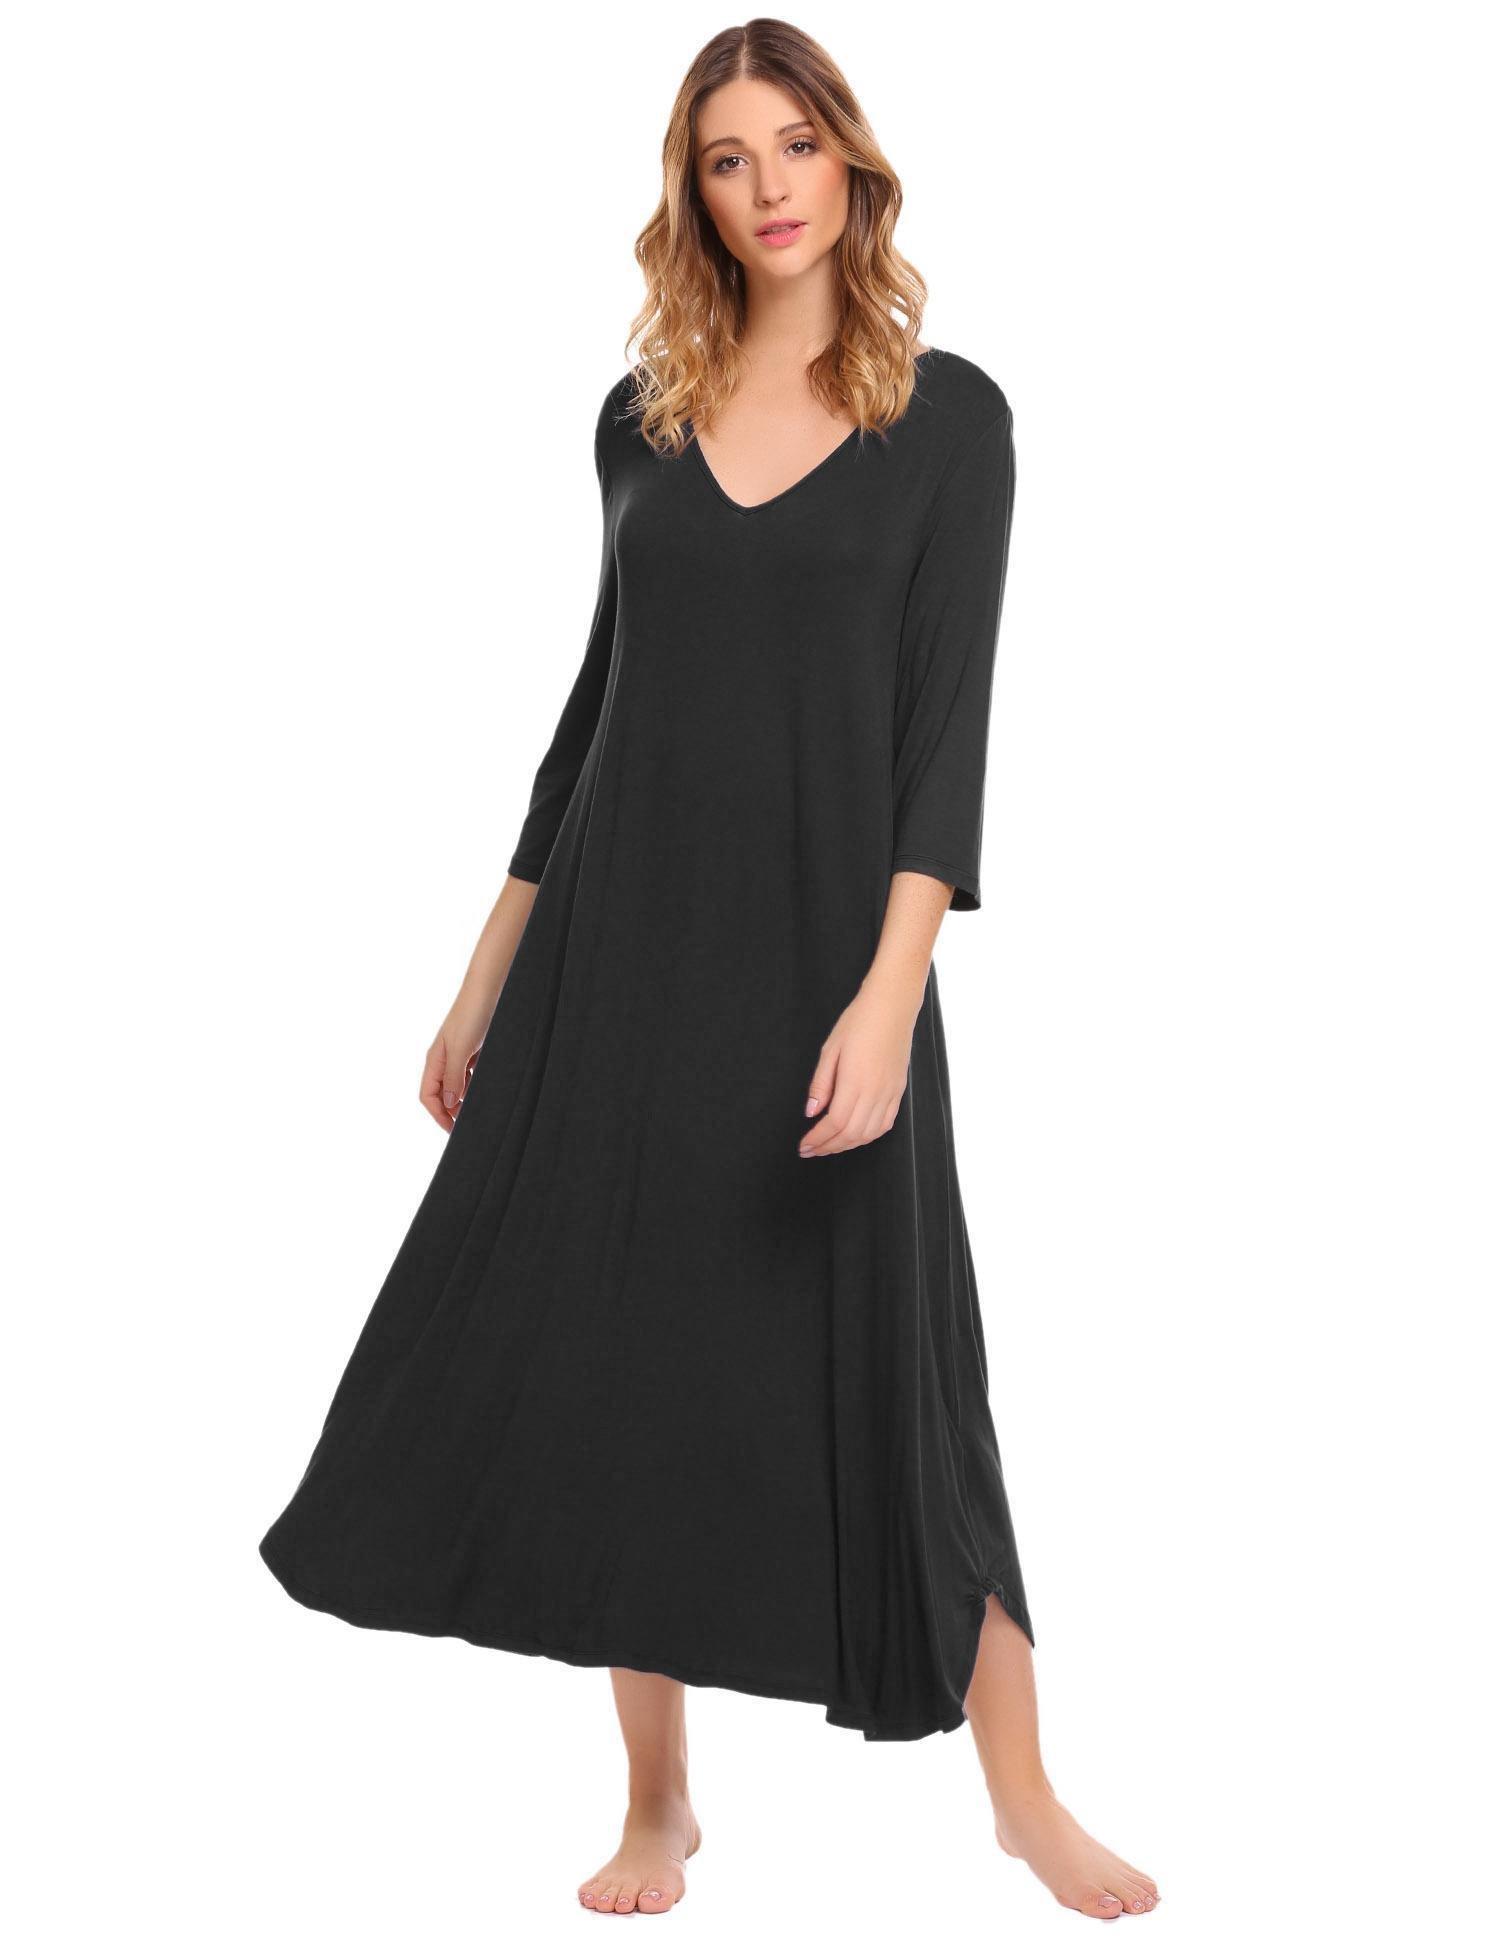 Ekouaer Women's Nightgown V Neck Nightshirt Full Slip Chemise Under Dress Sleepwear (Black, L)